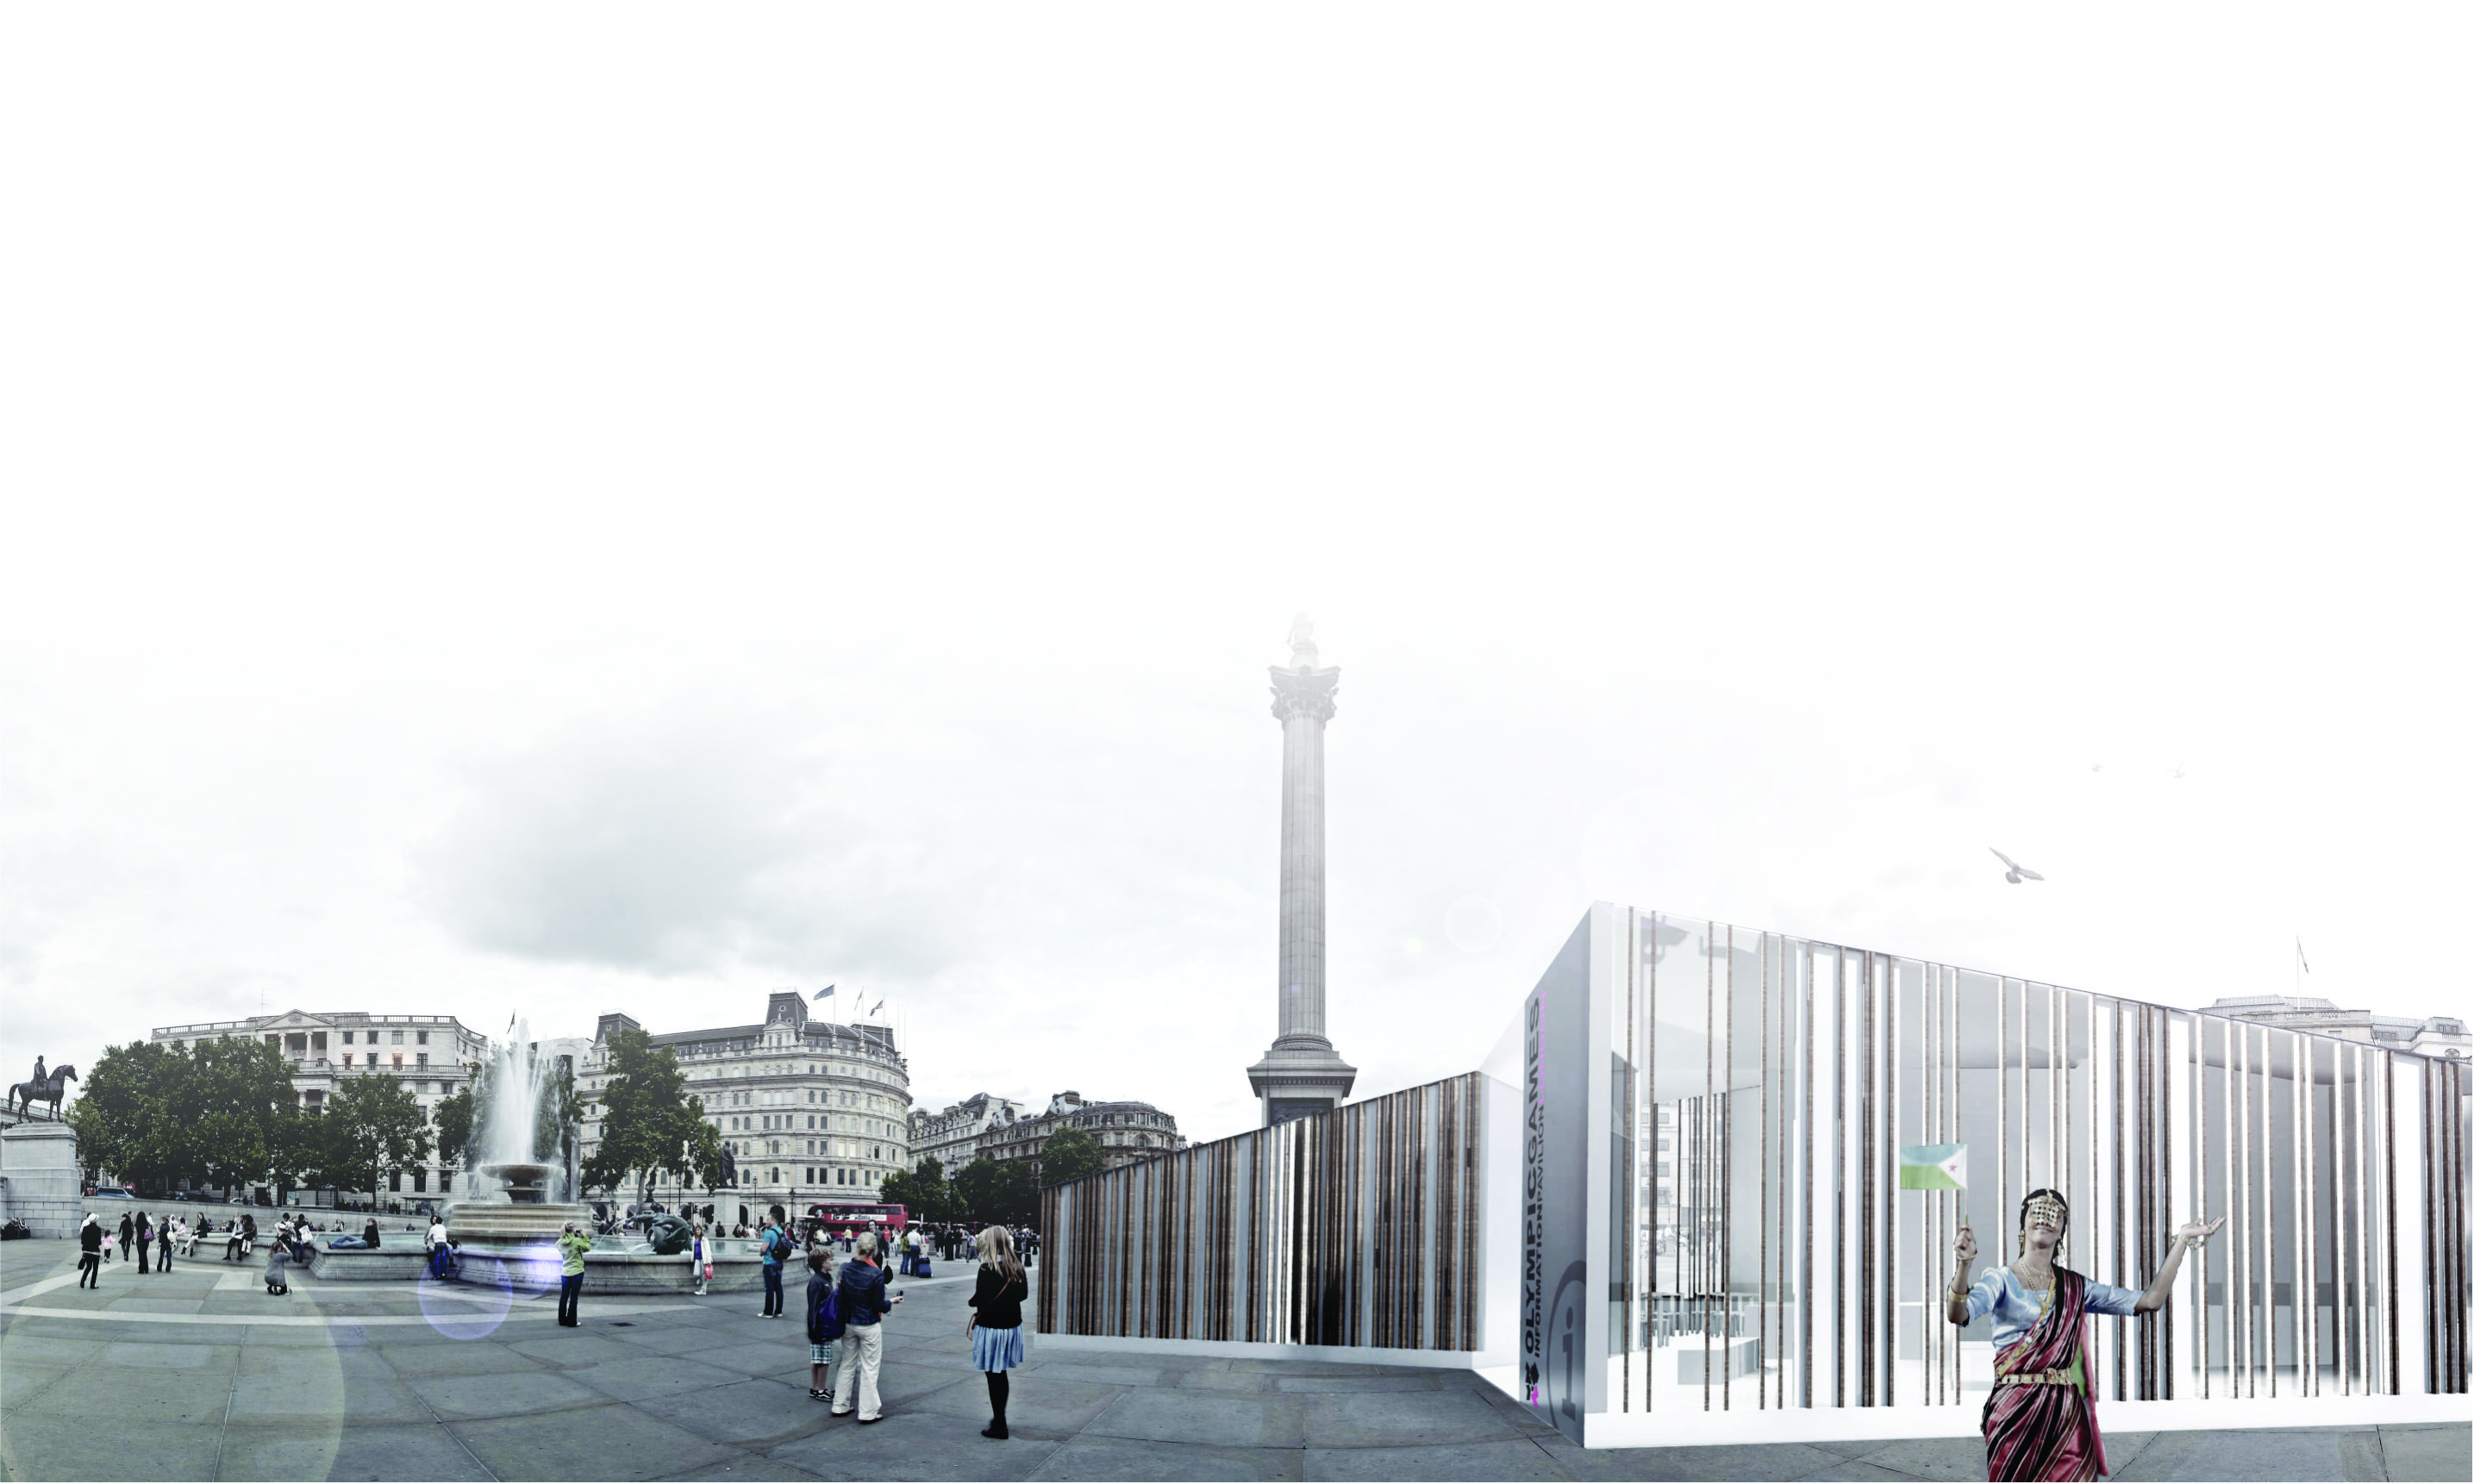 Informative Pavillion – Olympic Games, London 2012